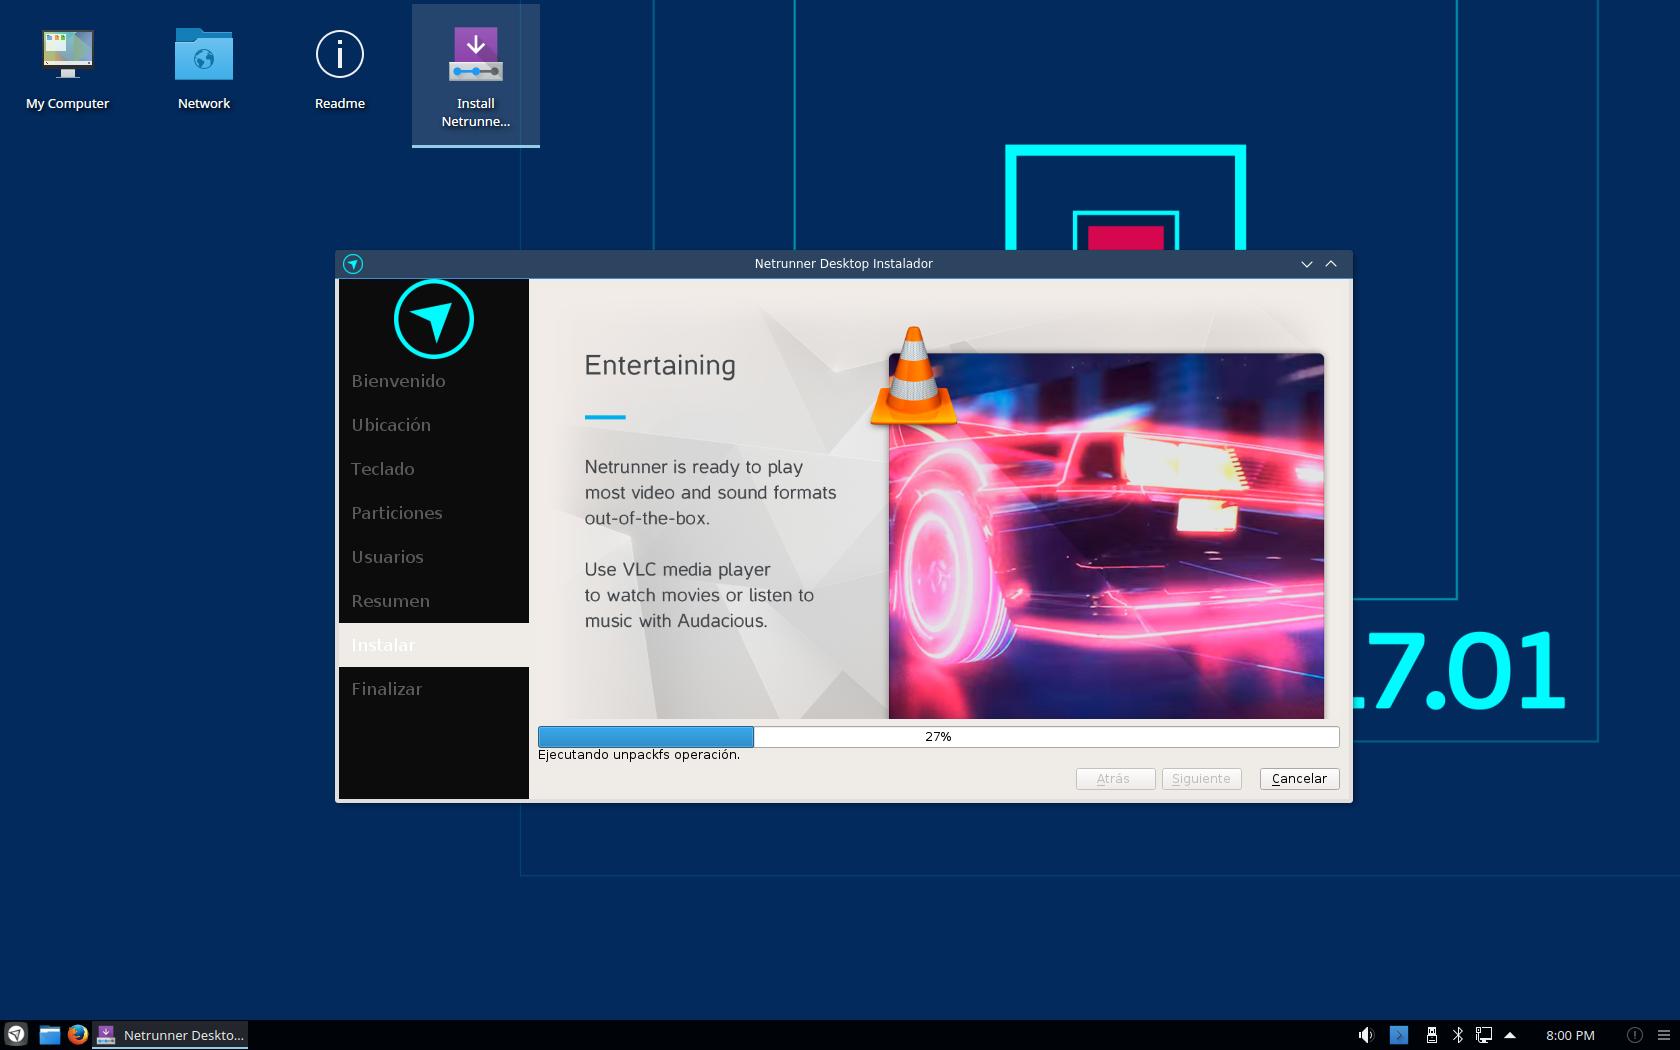 Netrunner Desktop 17.01.2 já está disponível para download